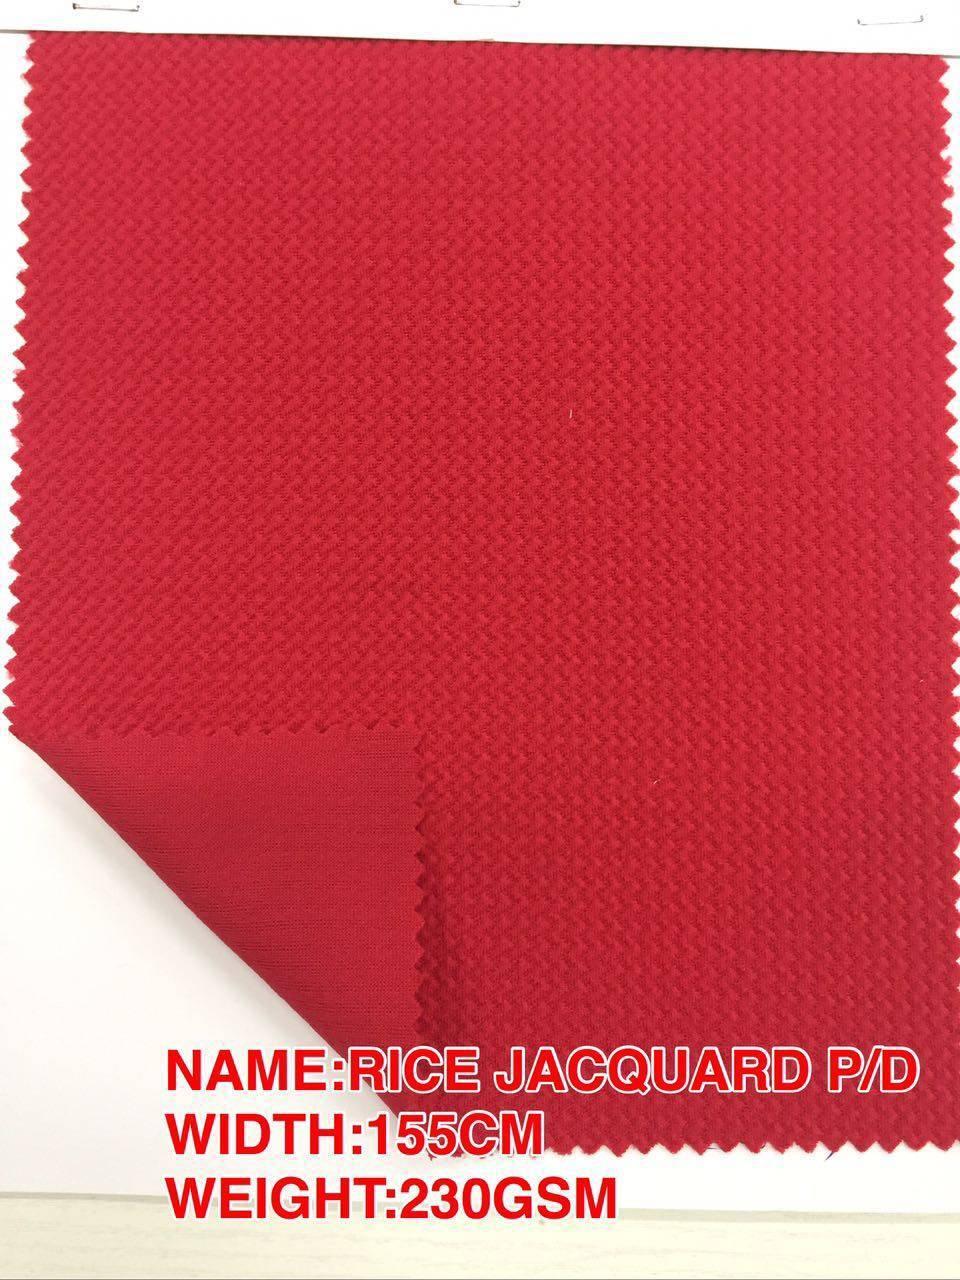 RICE JACQUARD P/D